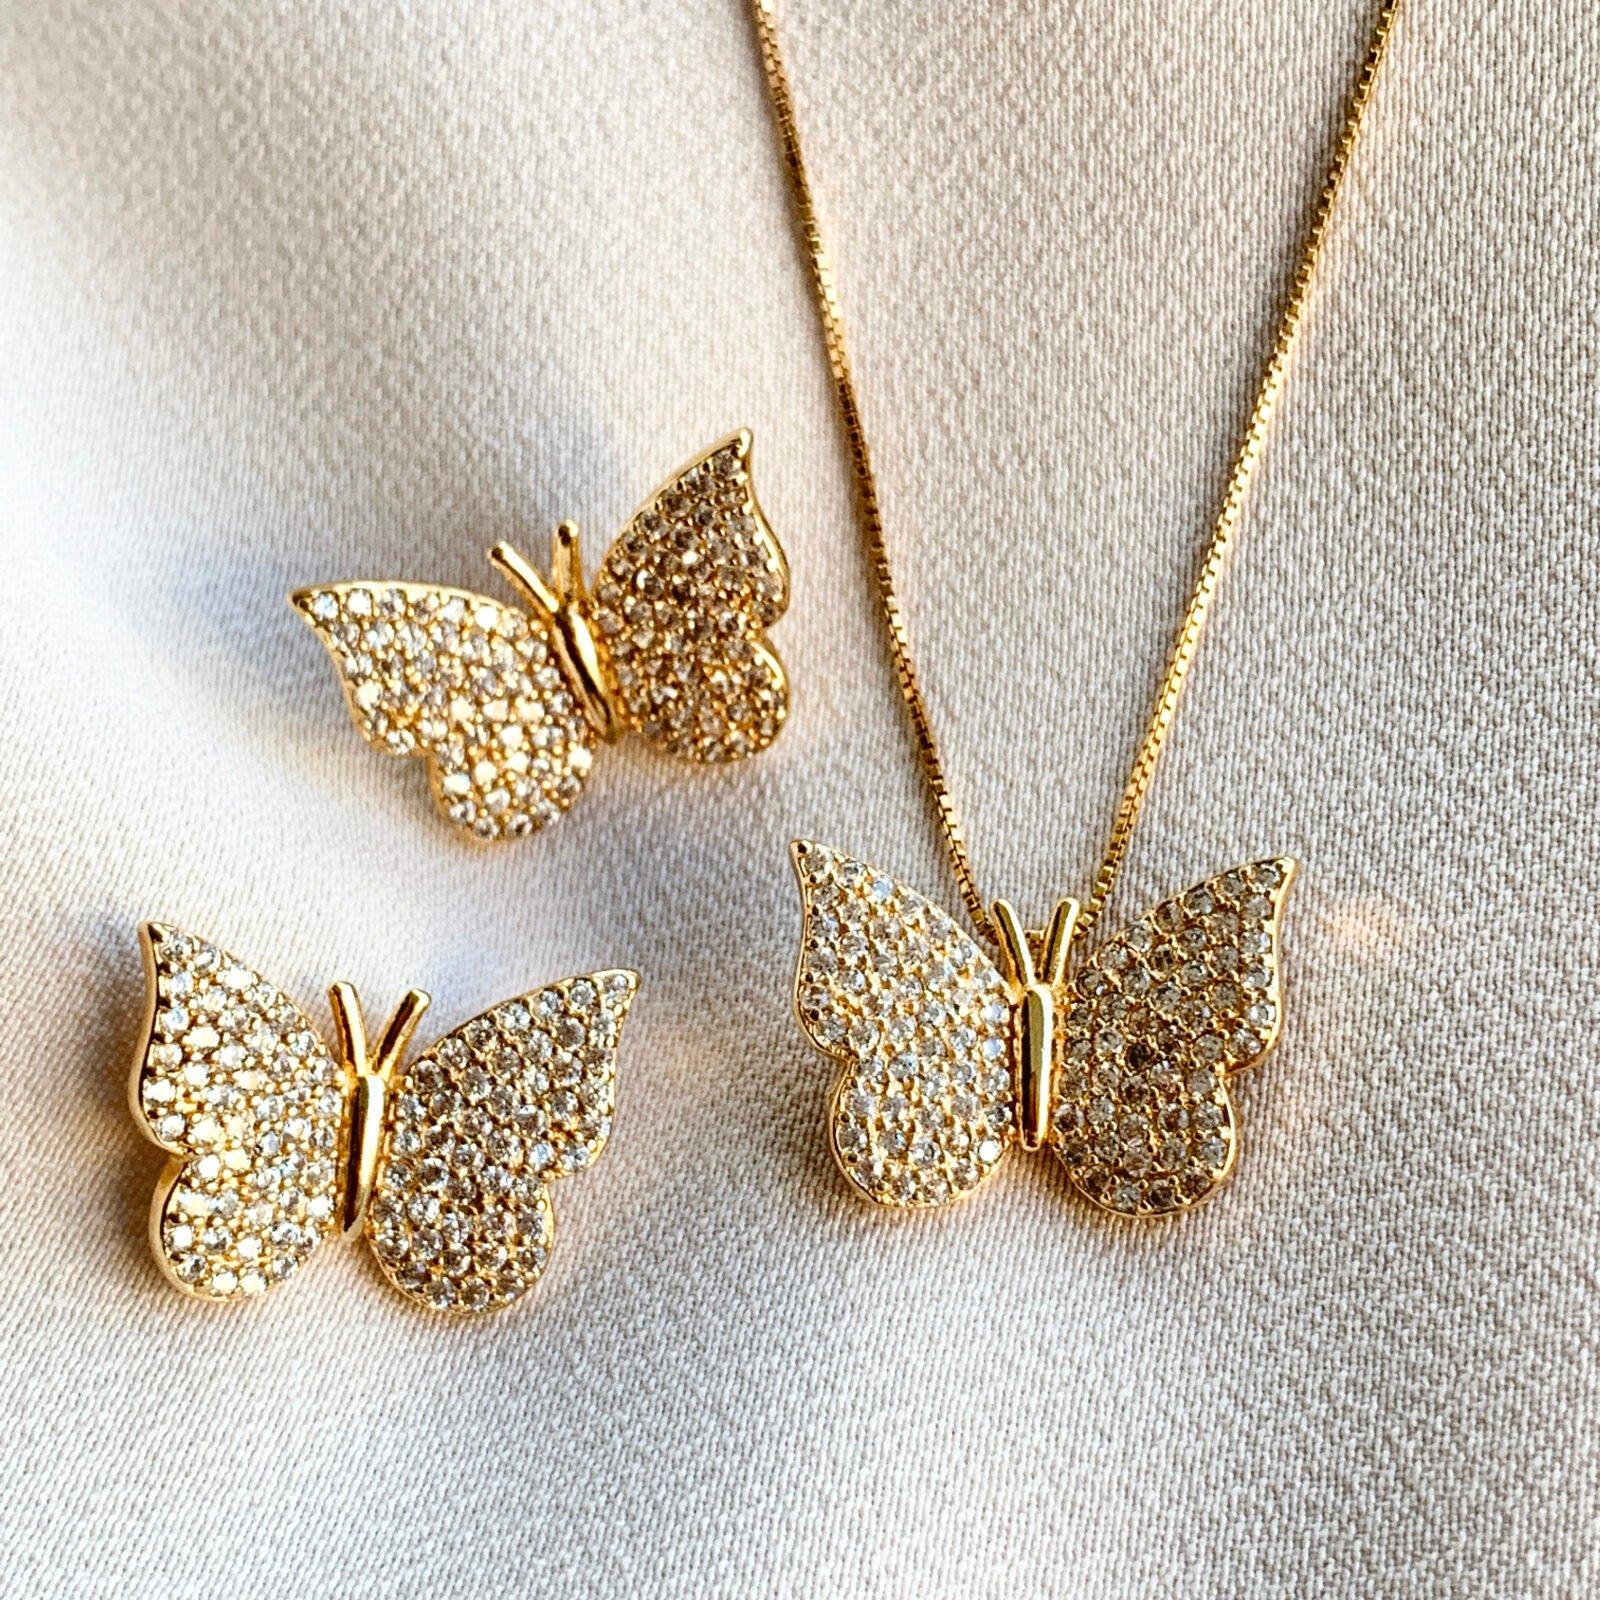 Conjunto Borboleta Dourada de Prata 925 | Lanarée Acessórios